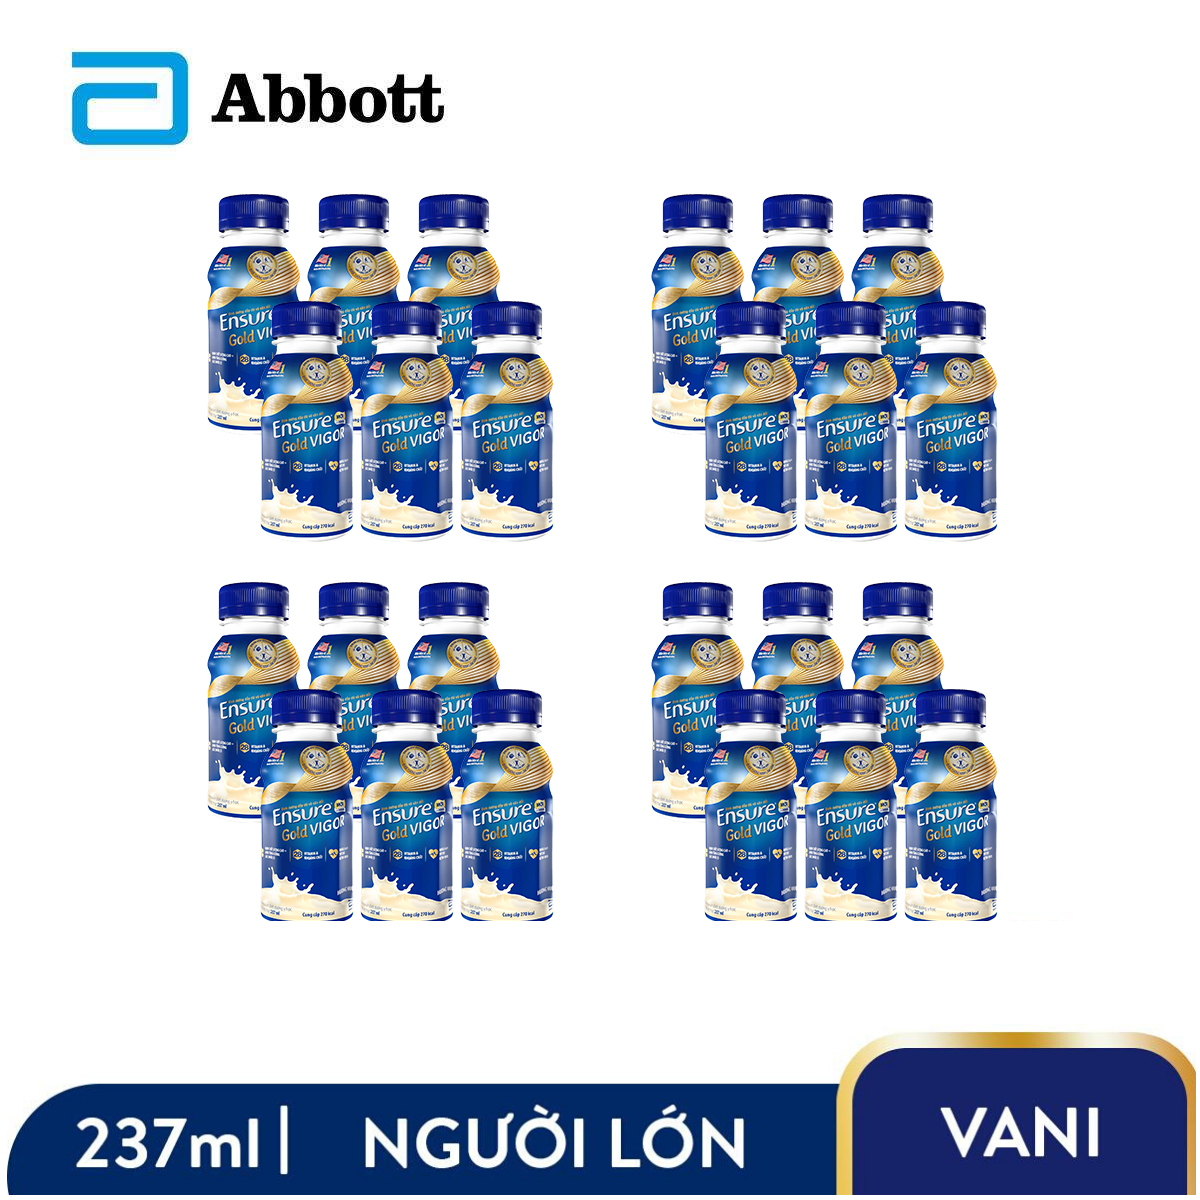 Thùng 24 chai sữa nước Ensure Gold Vigor 237ml